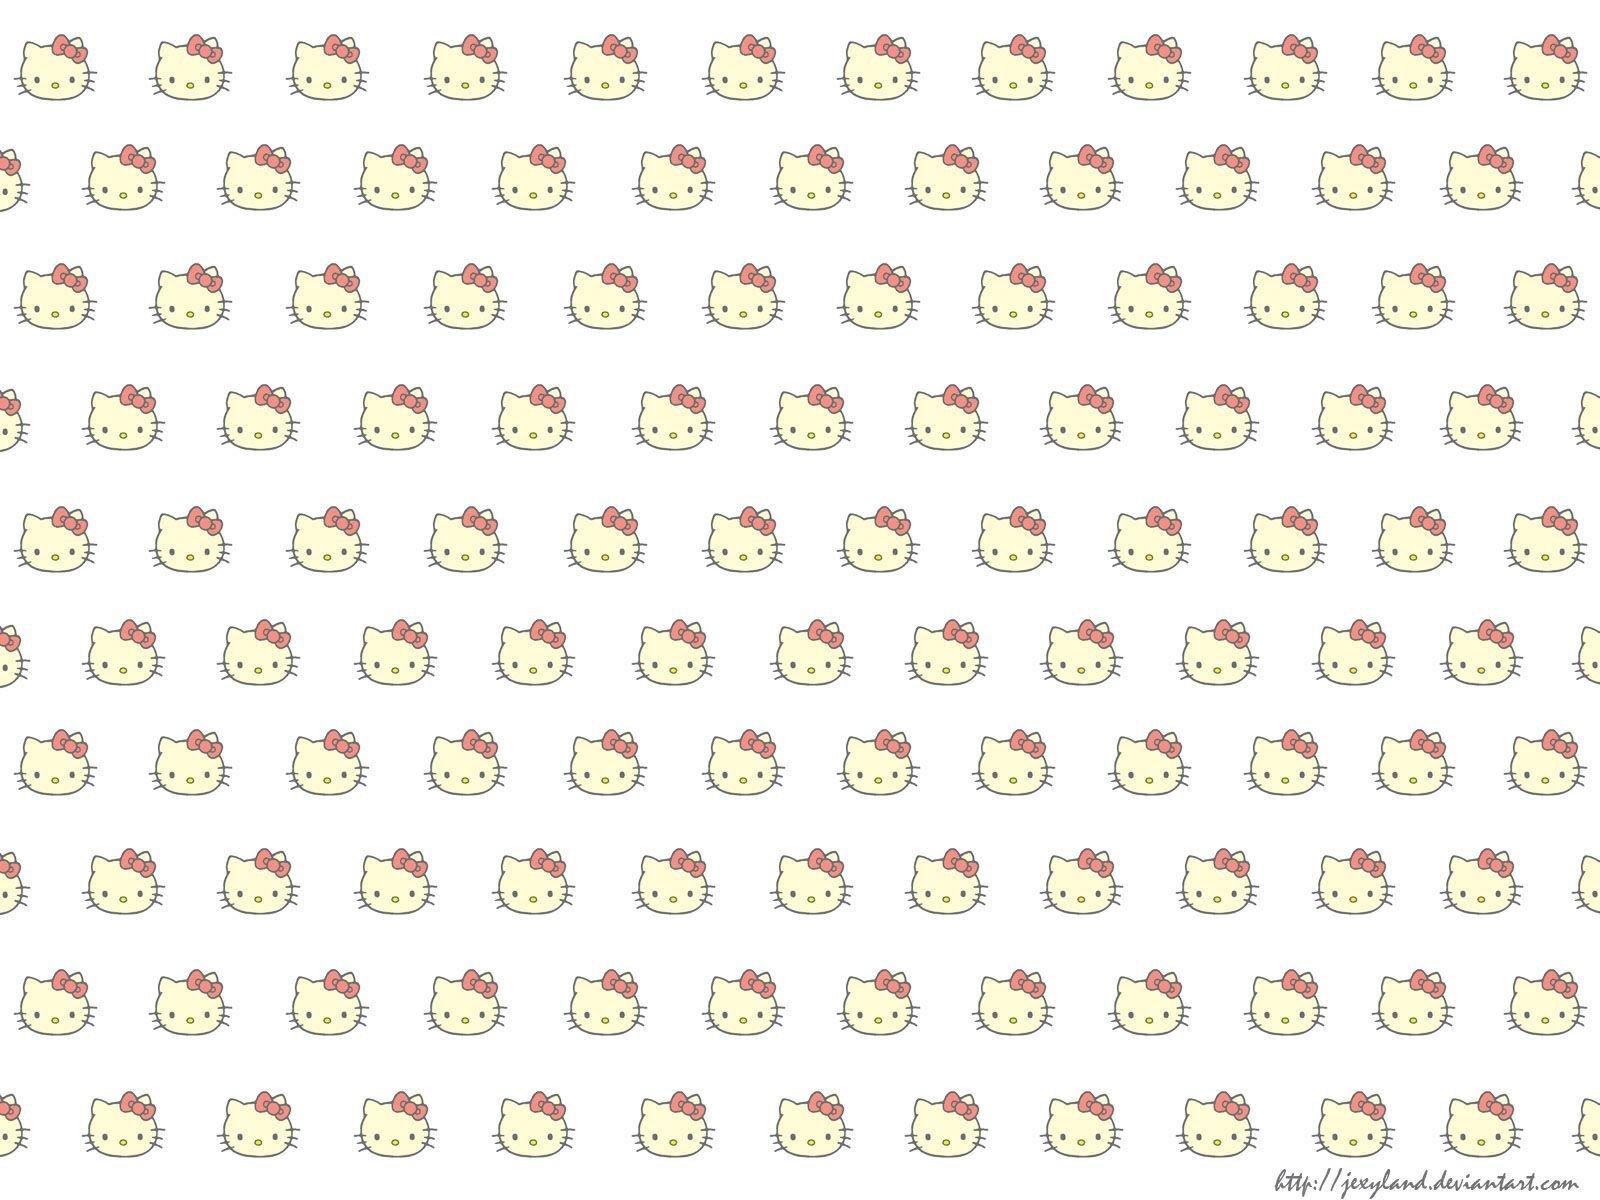 Popular Wallpaper Hello Kitty White - 6fc62a65f70a393b5b5a36cf334cec4f  Graphic_701330.jpg